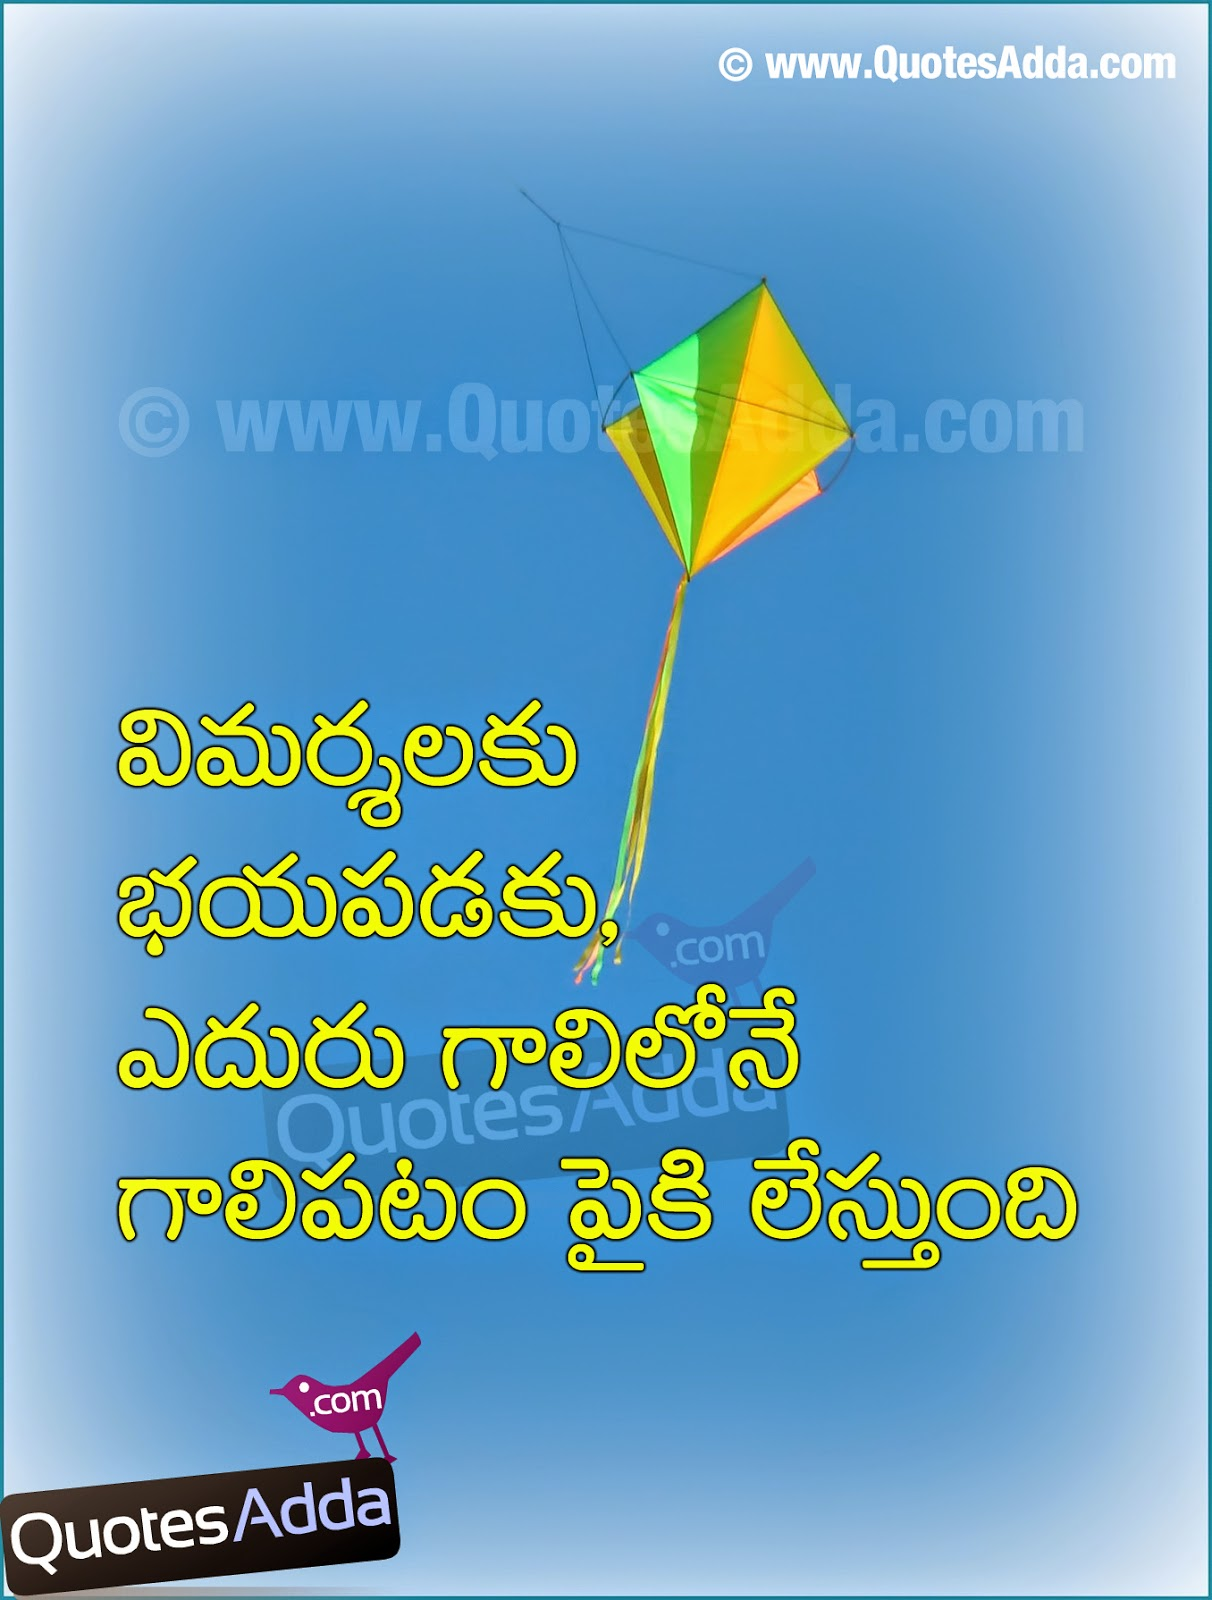 best telugu nice inspiring quotes wallpapers quotesadda